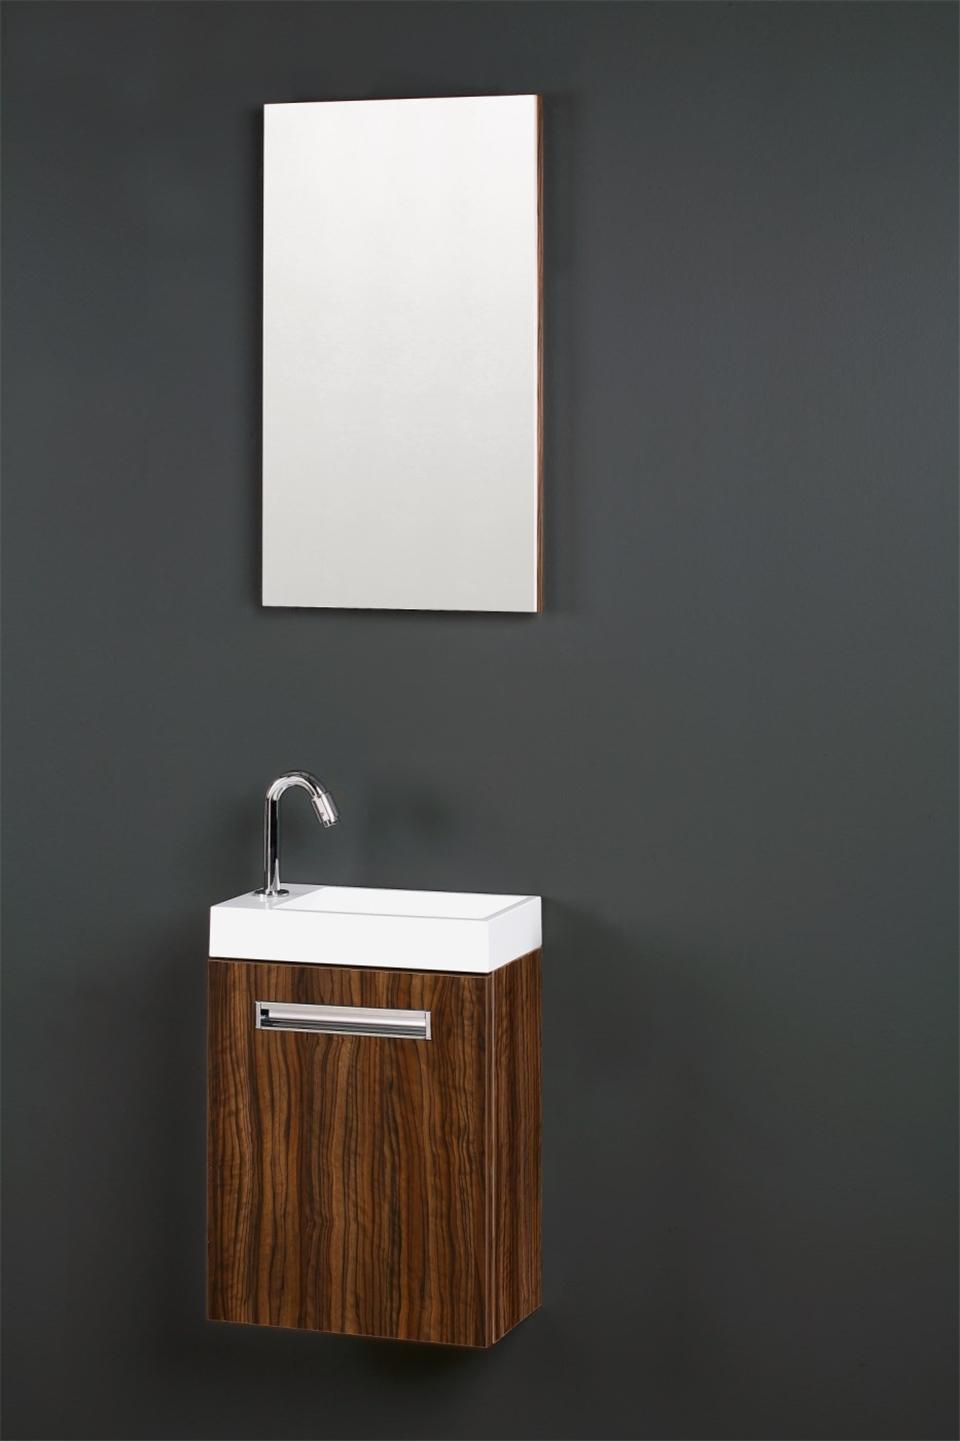 Thebalux toiletmeubel met wastafel Global - Product in beeld ...